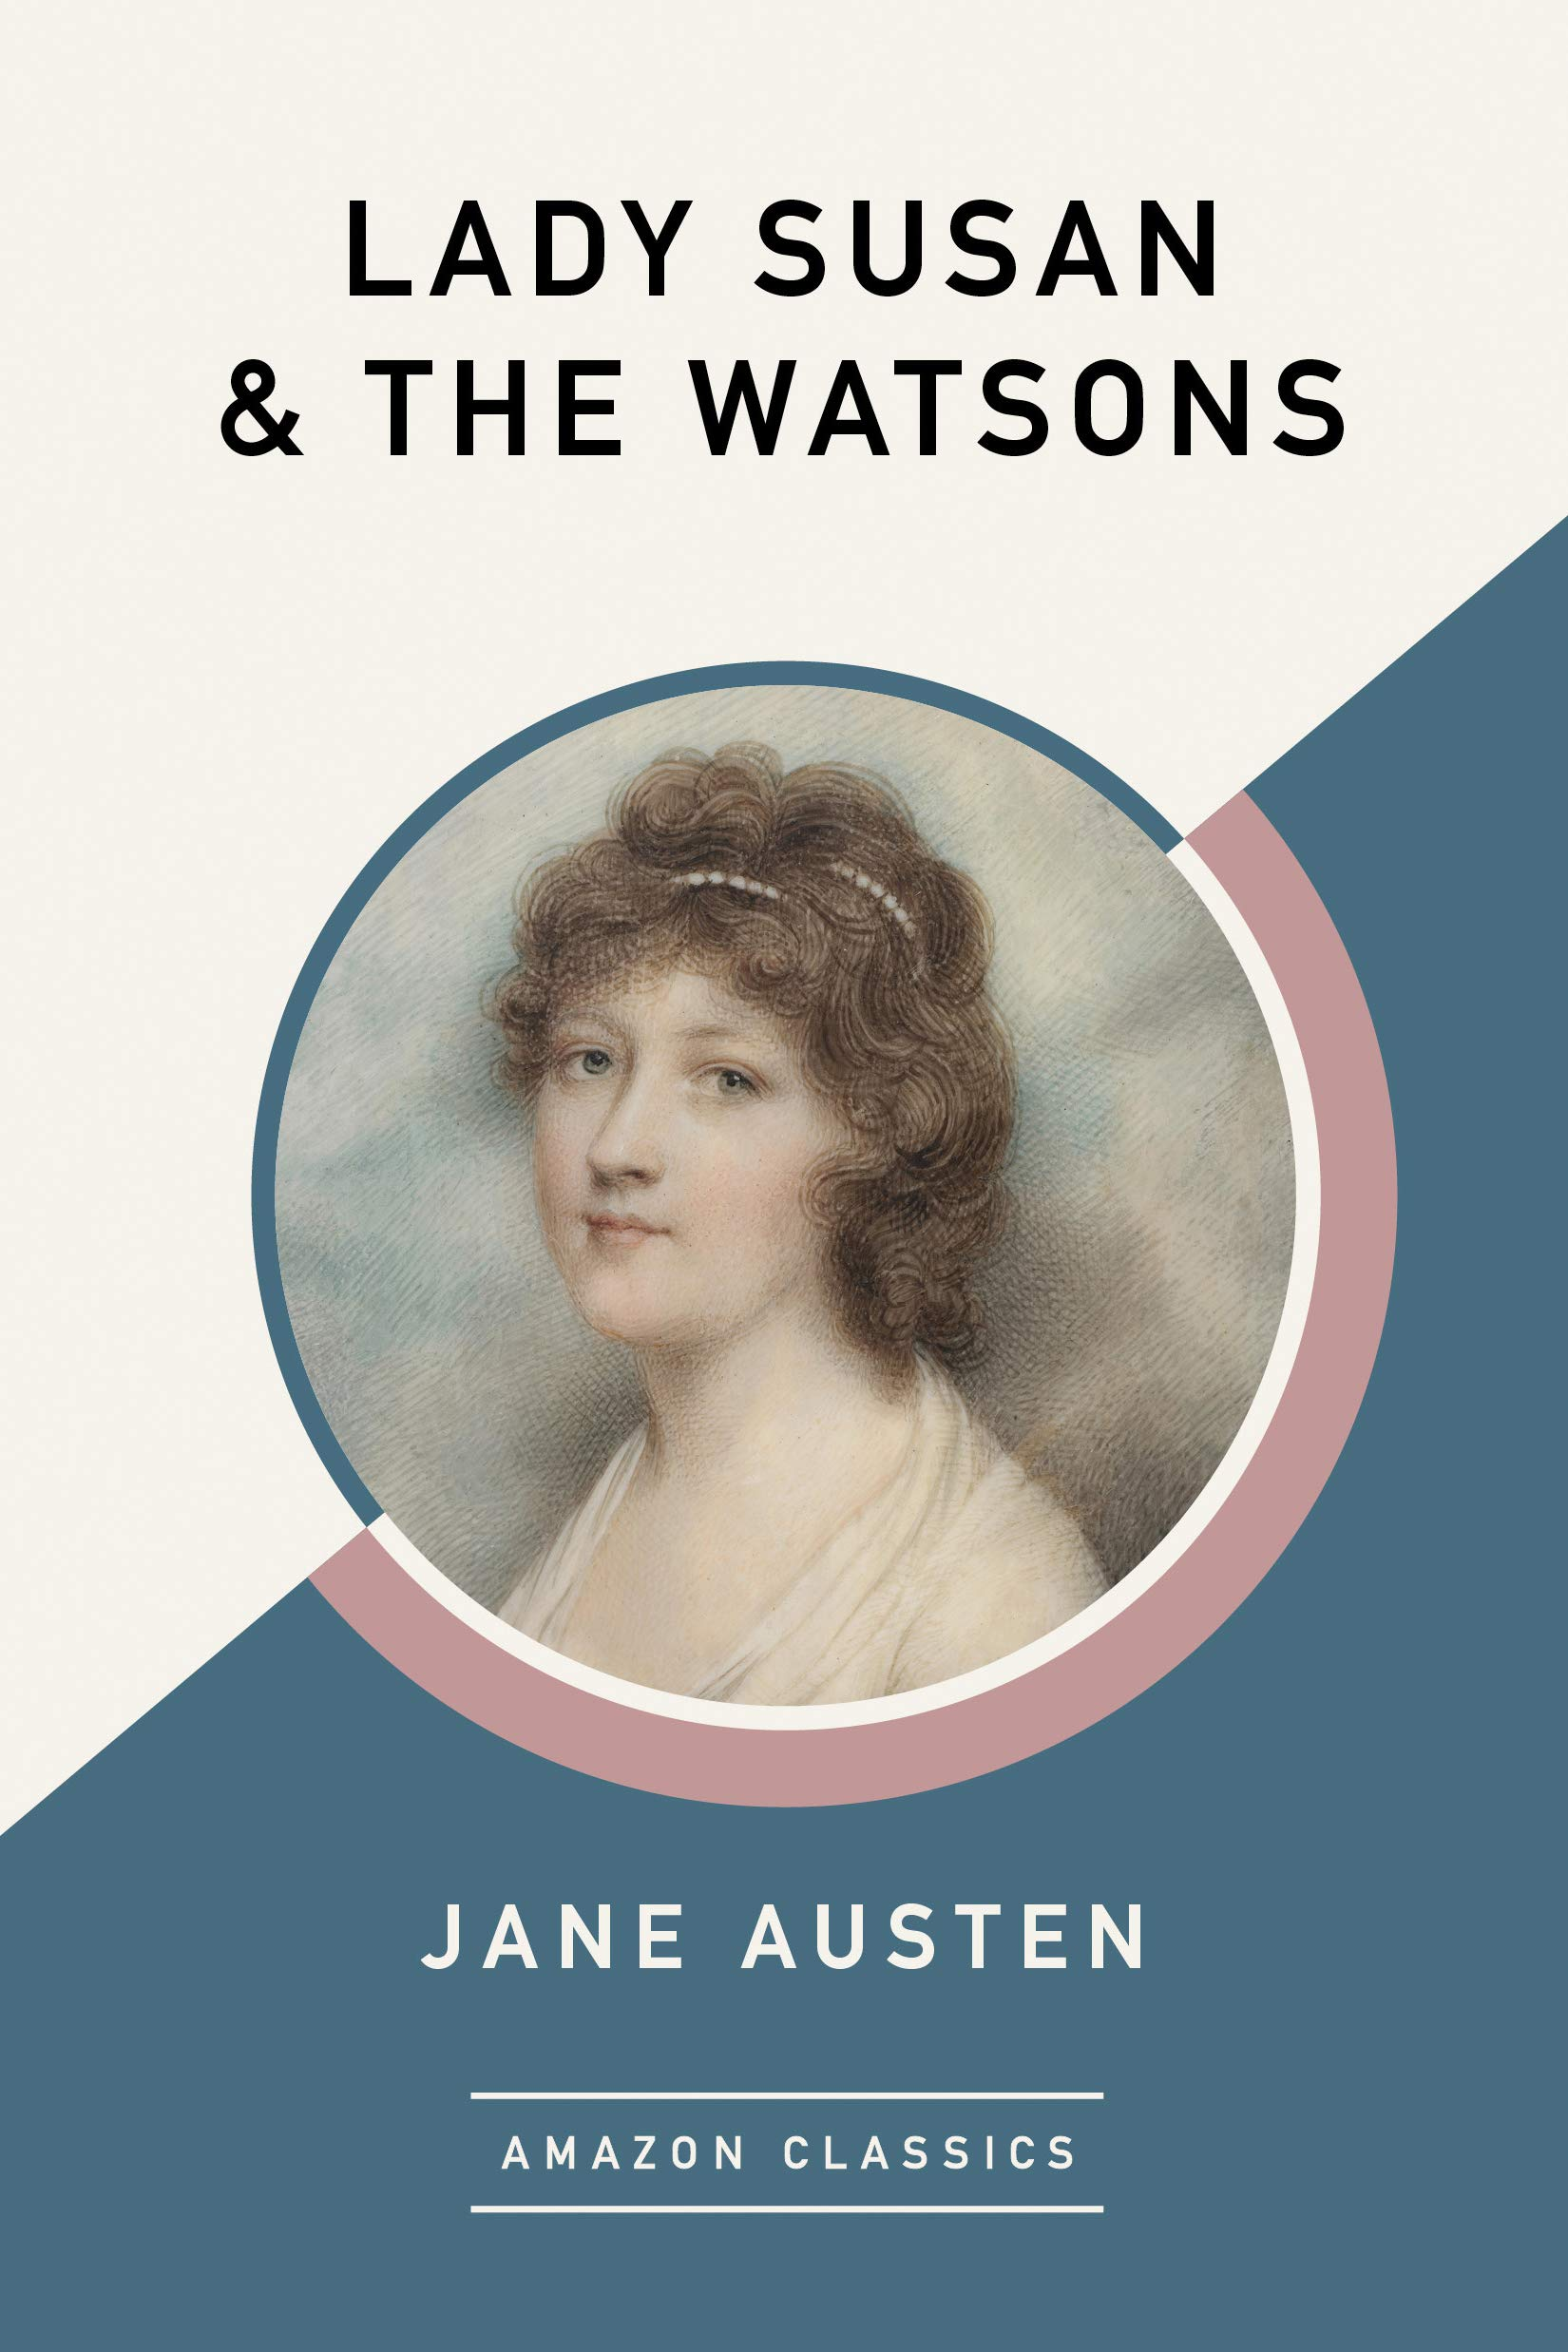 Lady Susan & The Watsons (AmazonClassics Edition): Amazon.es ...